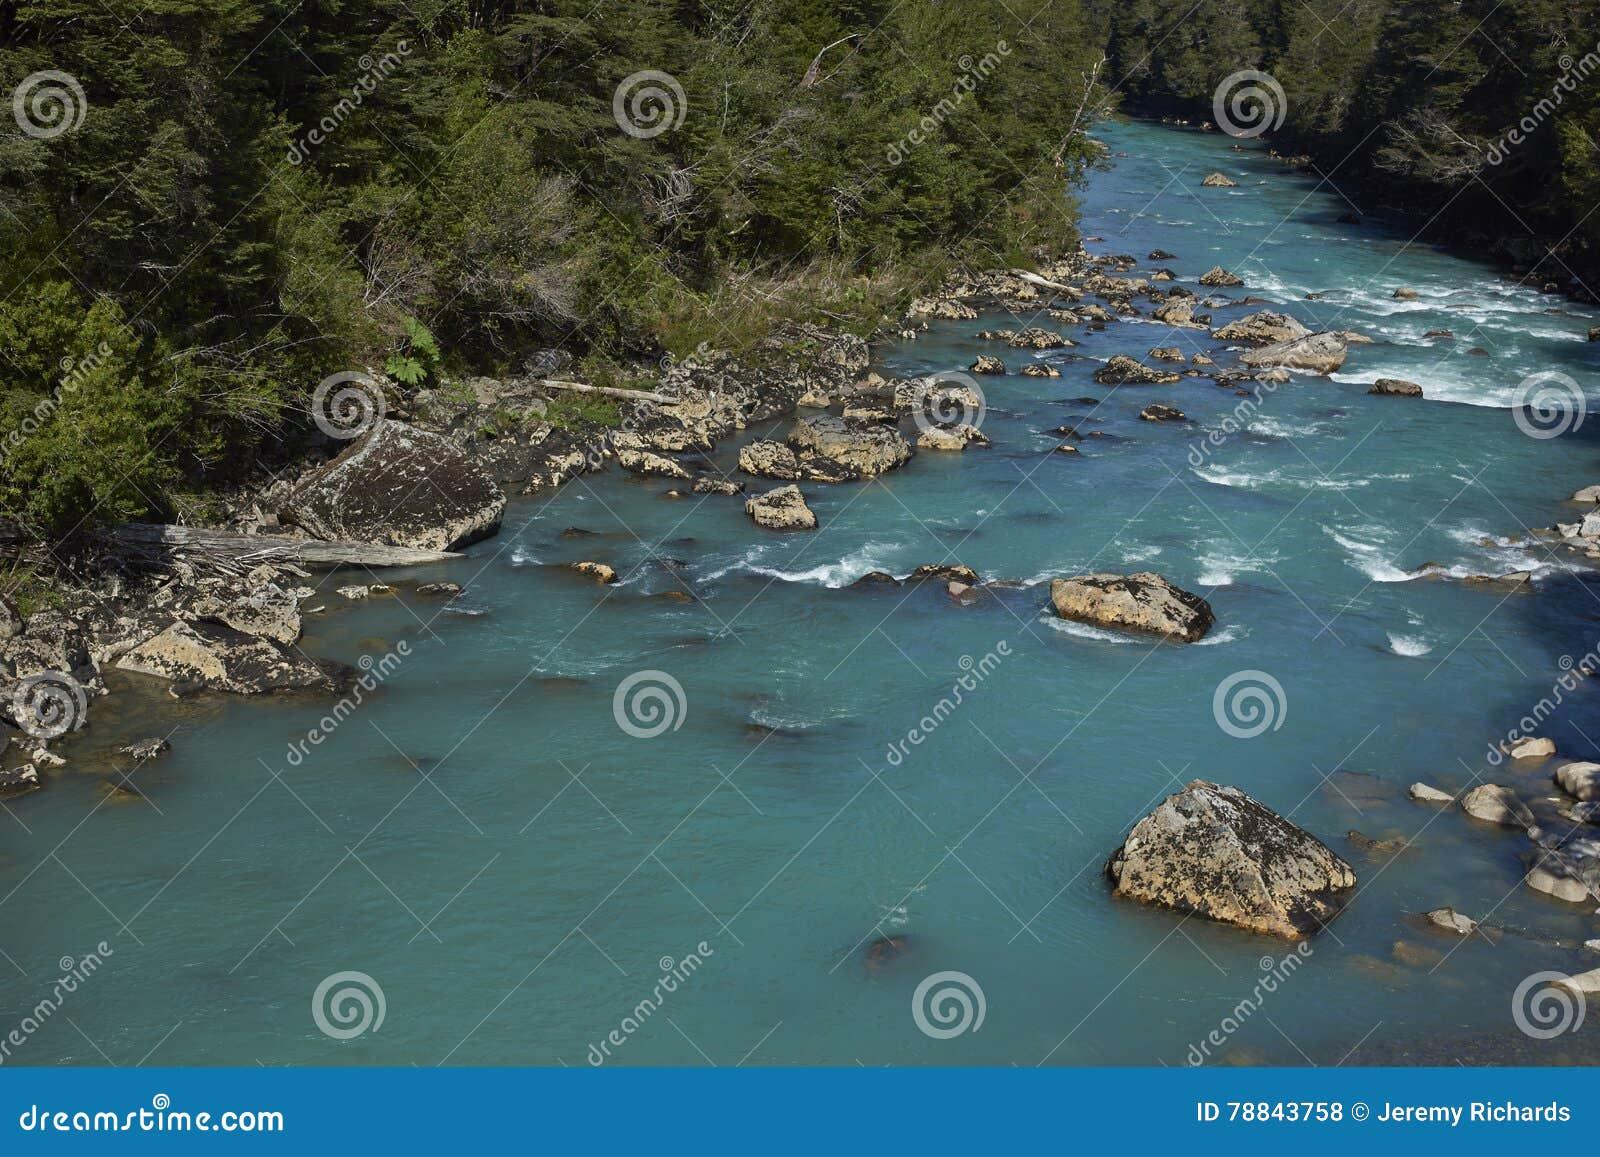 Patagonian River